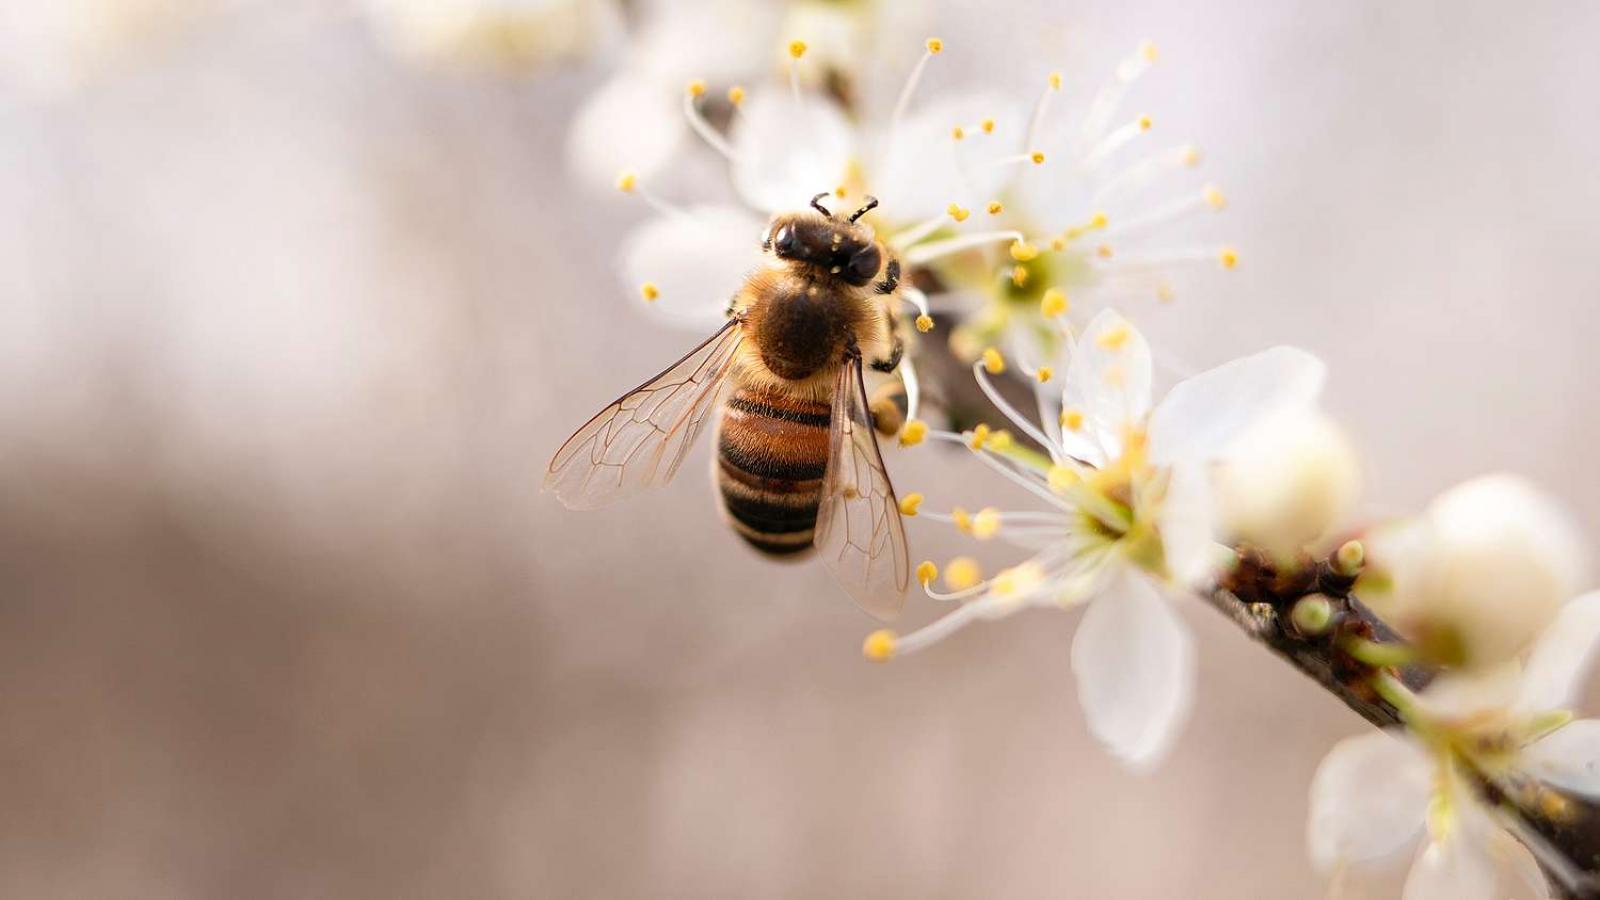 Nauka zdalna (14.04. - 17.04.2020r) grupa Pszczółki